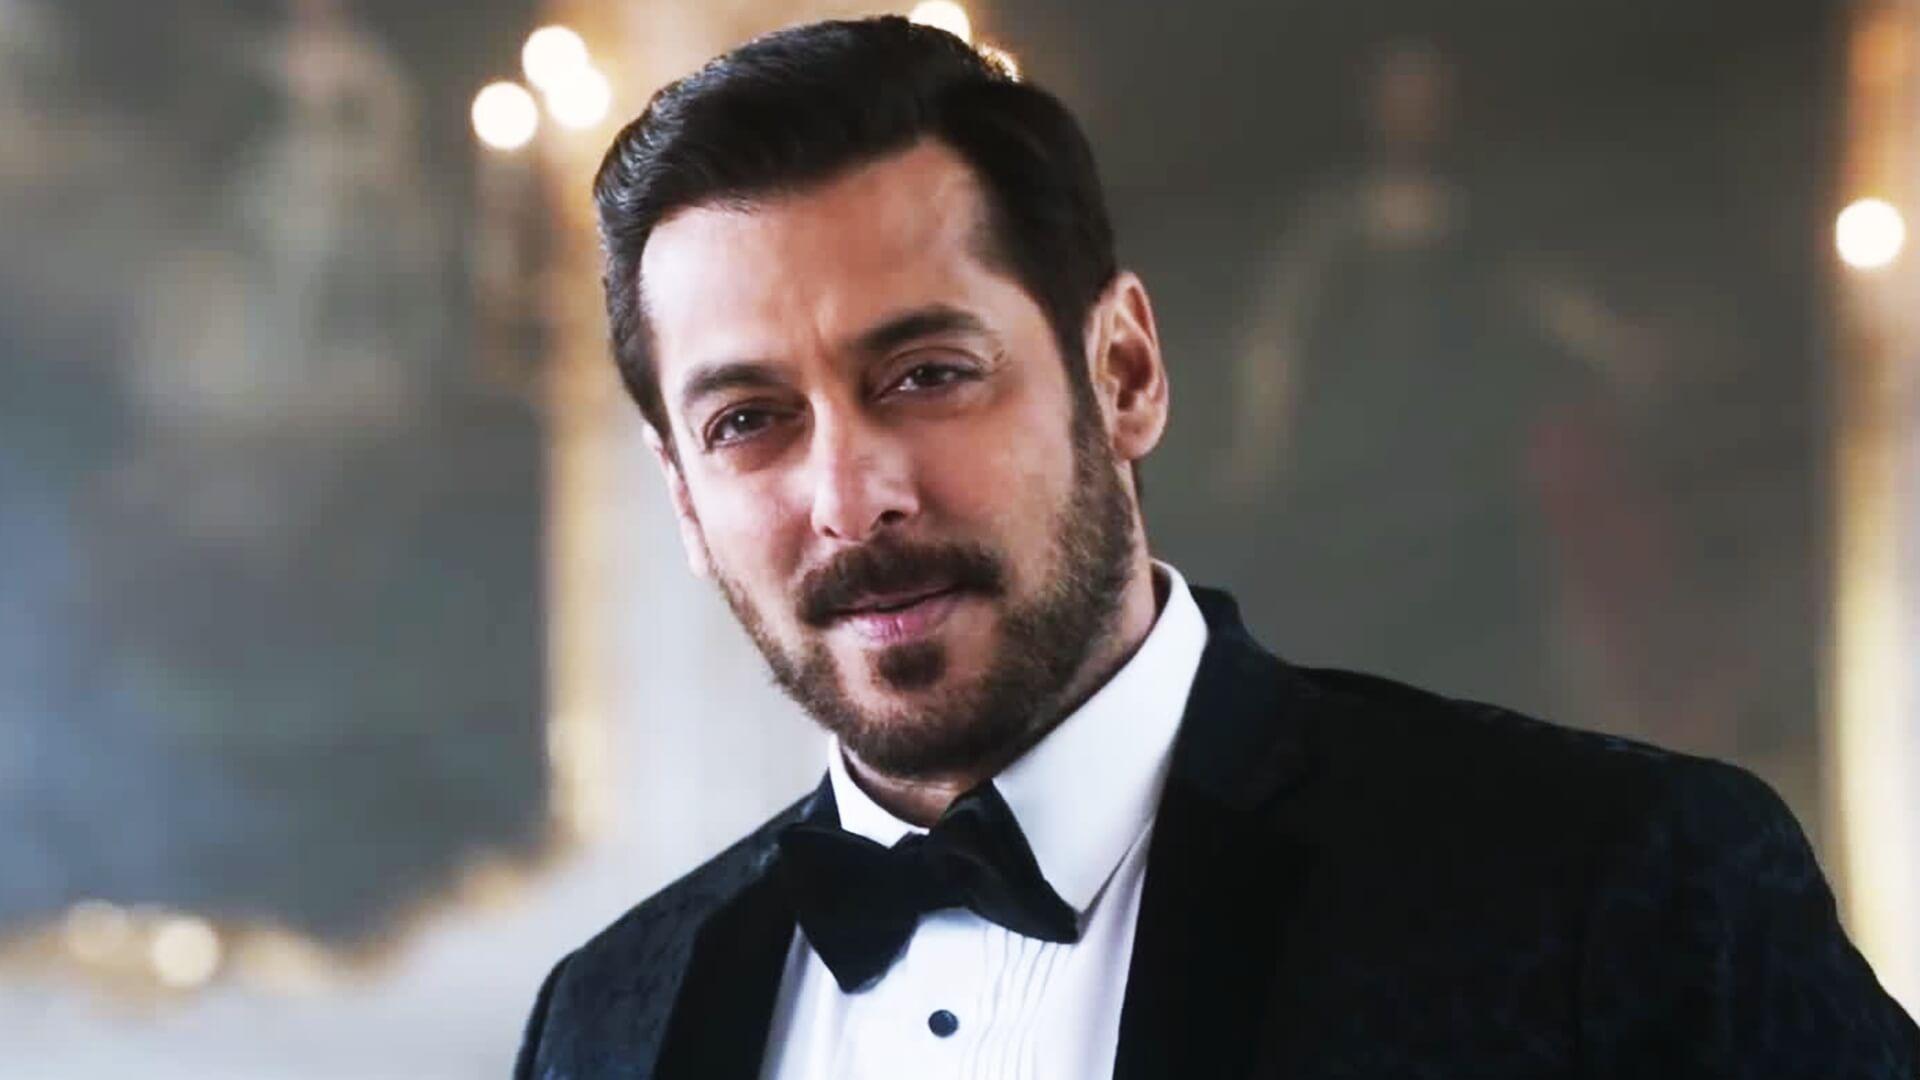 Salman Khan Photo, Age, News, Birthday, Height, Sister, Biography, Girlfriend, Awards, Address, Song, Video, Net Worth, Education, Twitter, Instagram, Facebook, Wiki, Imdb, Website, Youtube (60)